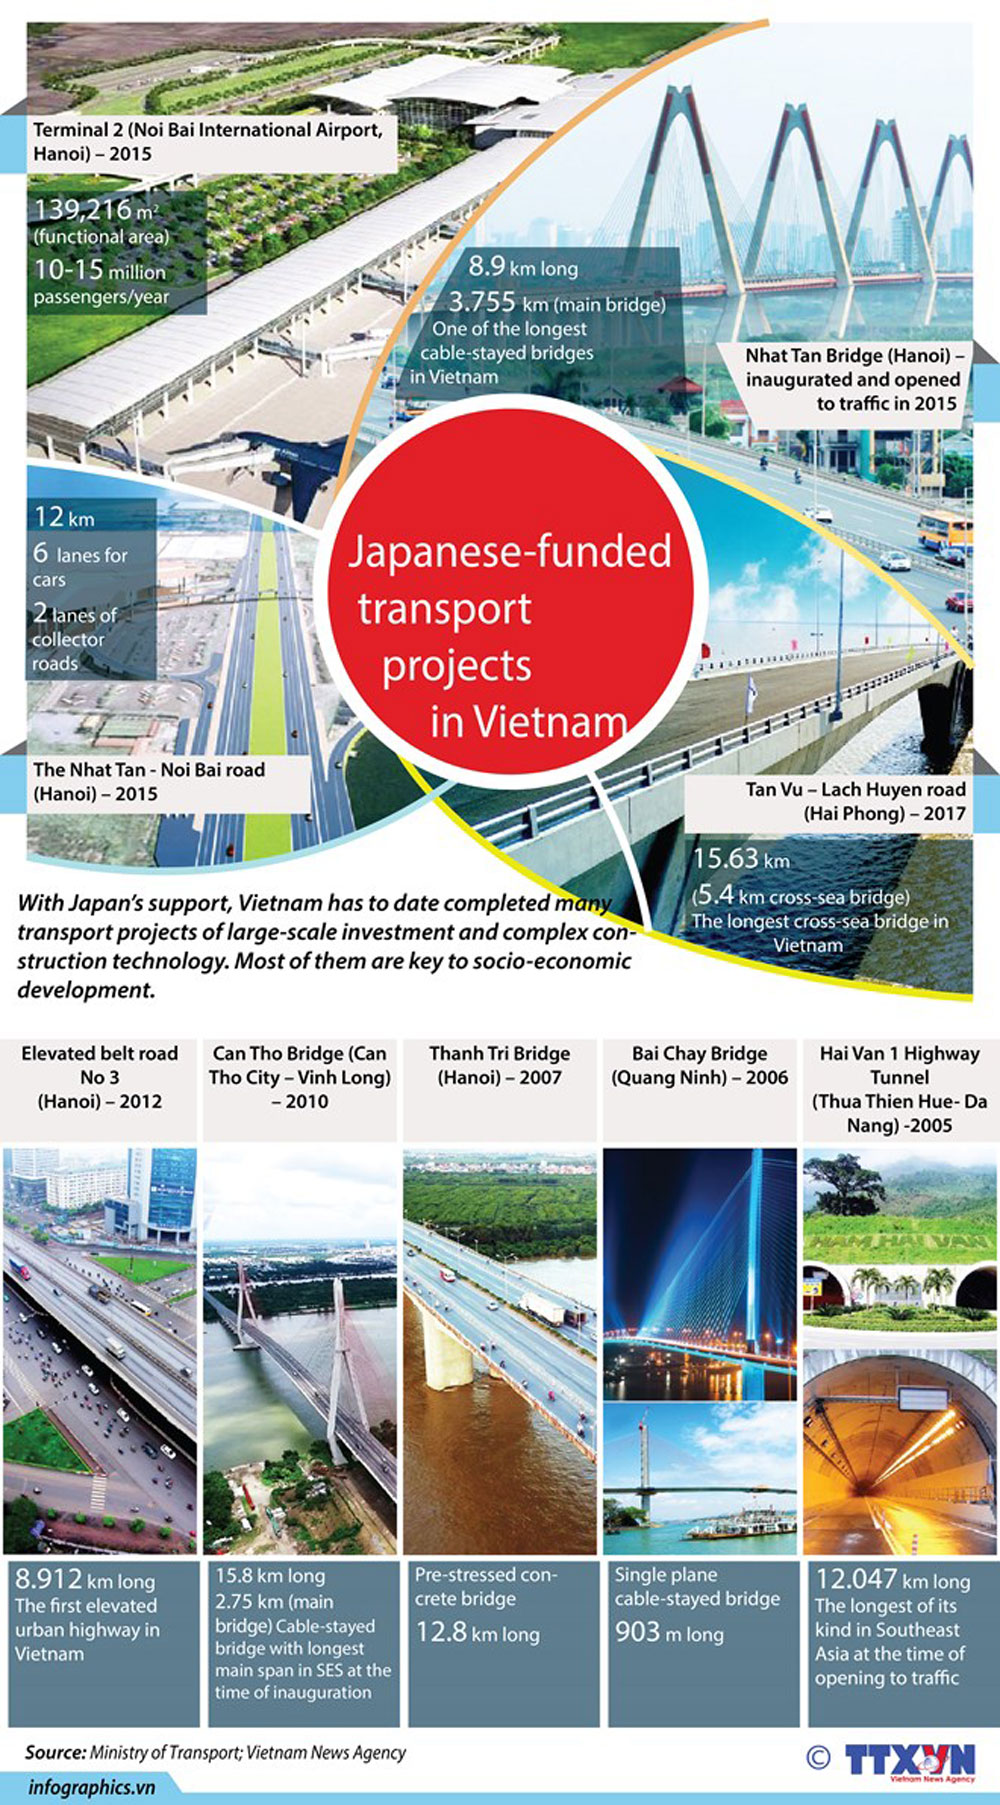 Japanese-funded, transport projects, Vietnam, Noi Bai International Airport, Nhat Tan bridge, Hai Van Highway Tunnel